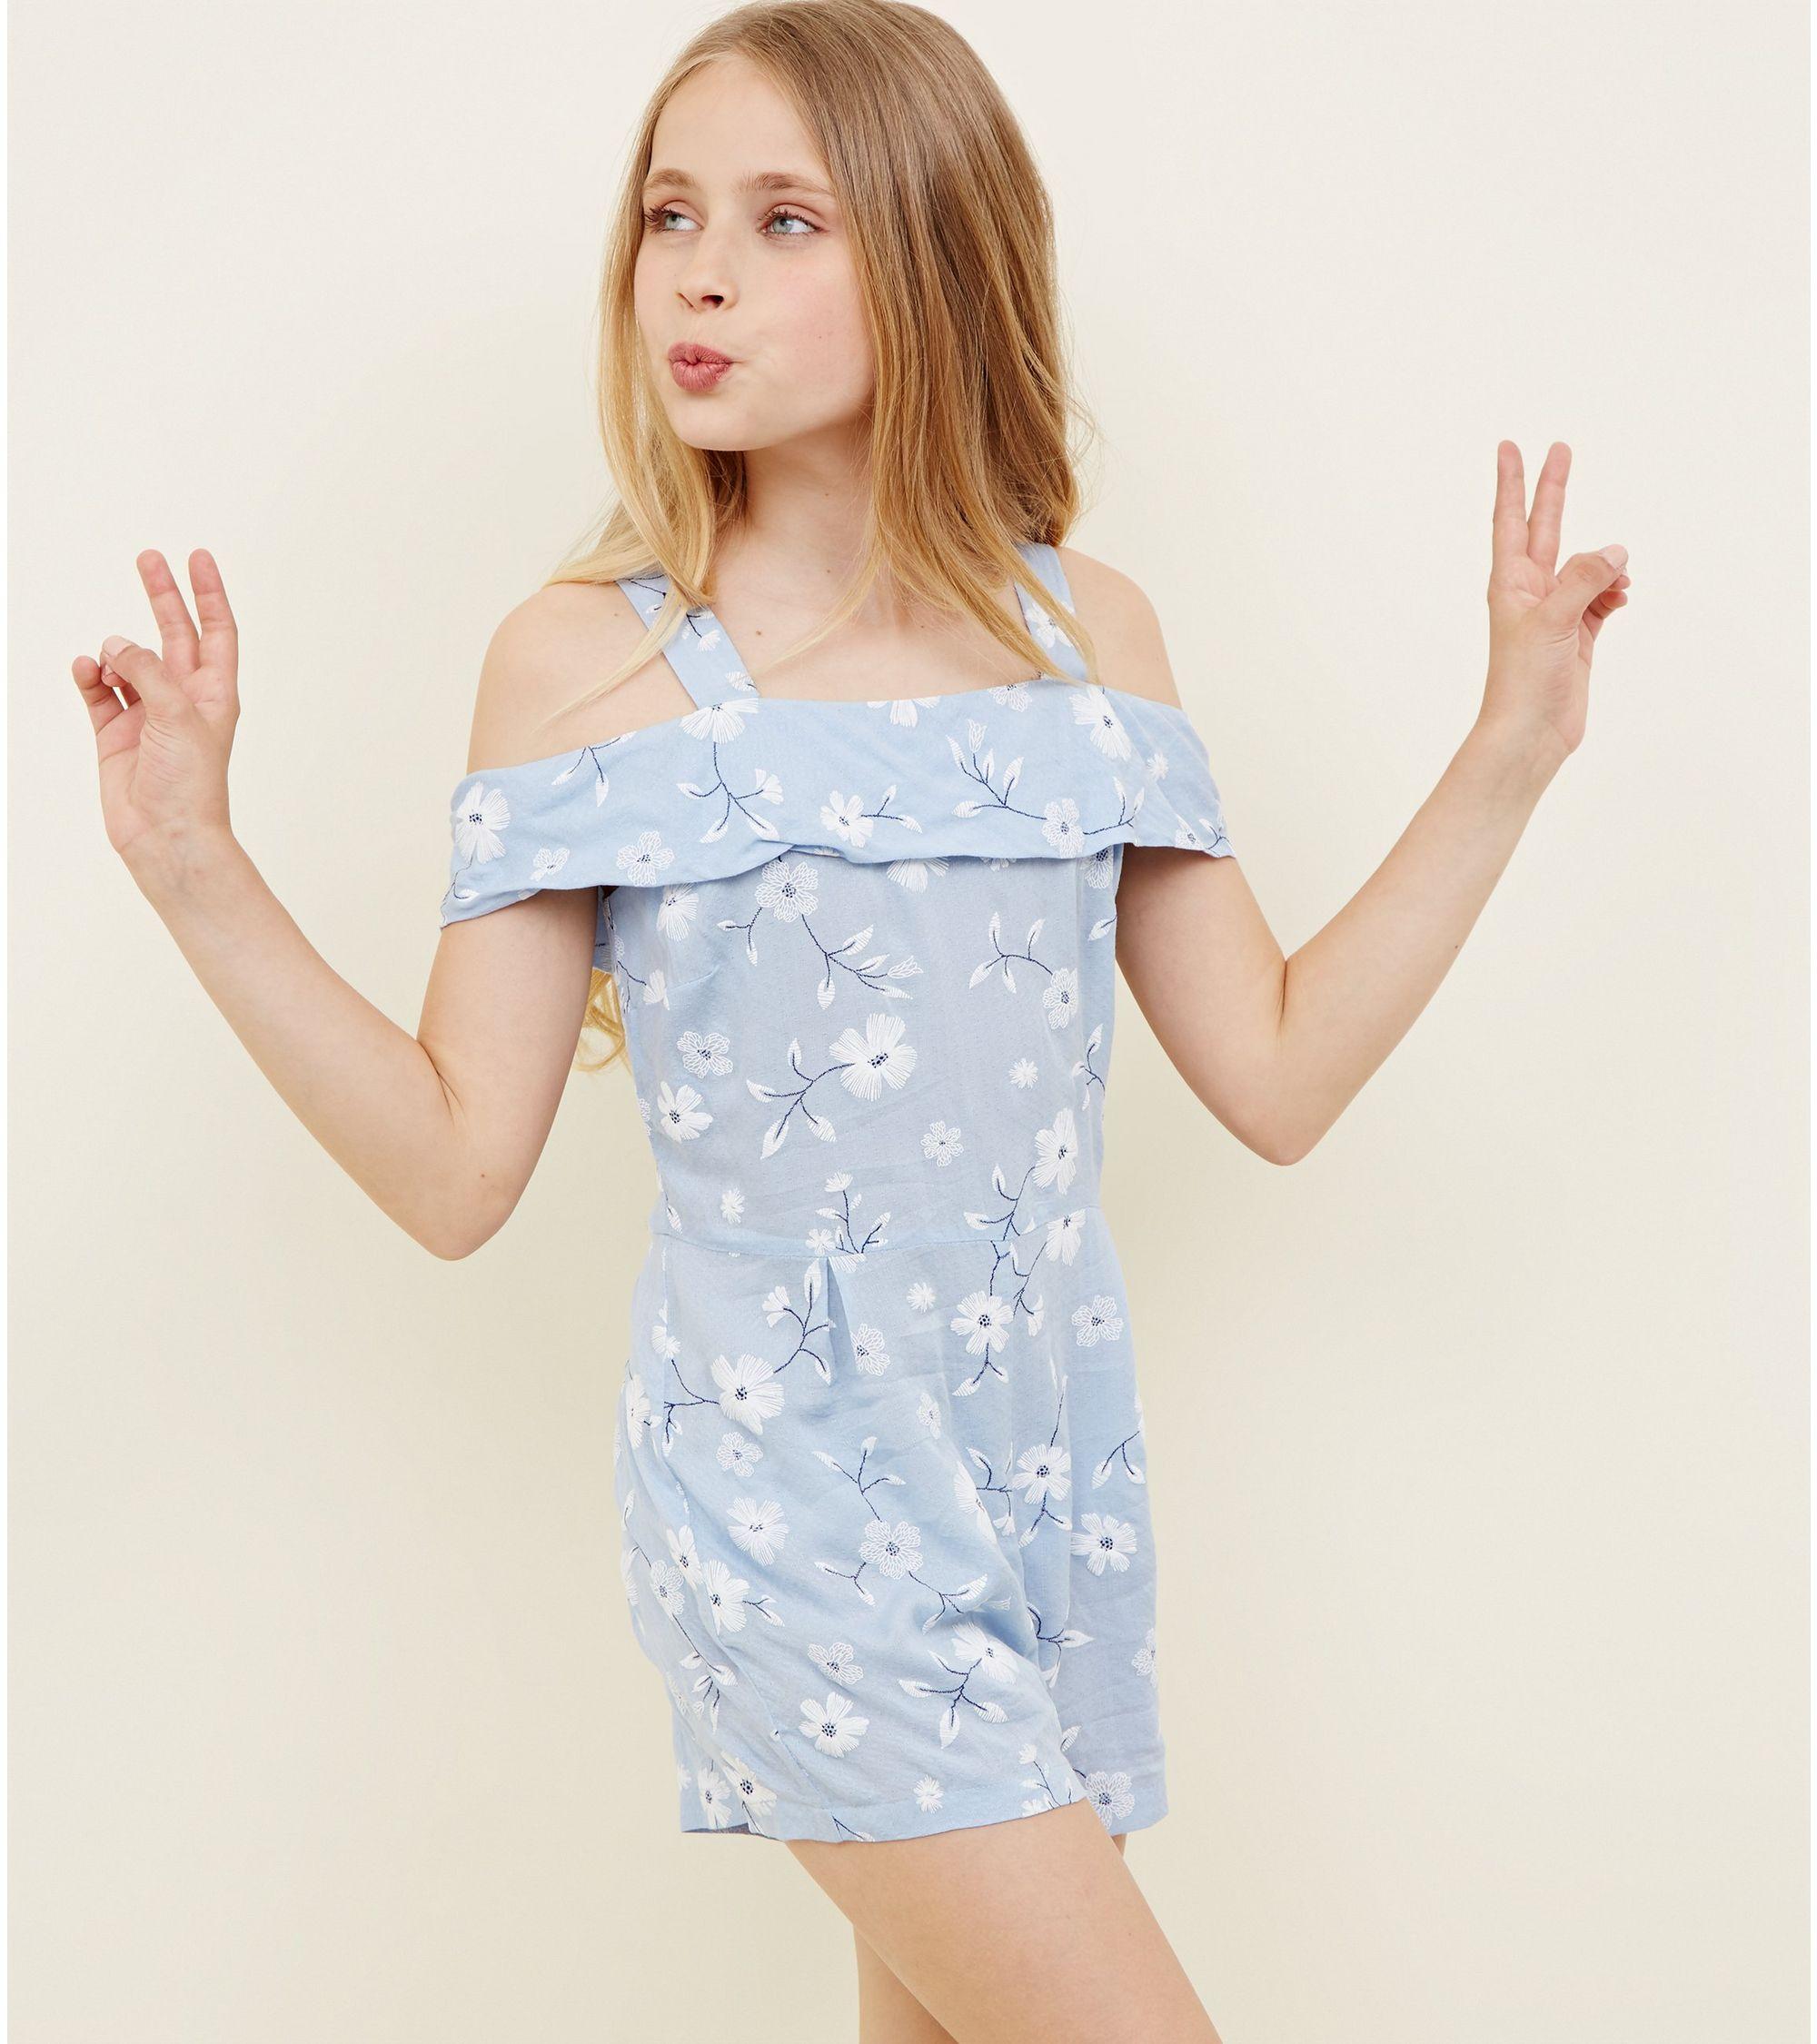 c0b15350f70b New Look Girls Blue Floral Puff Print Bardot Playsuit at £8